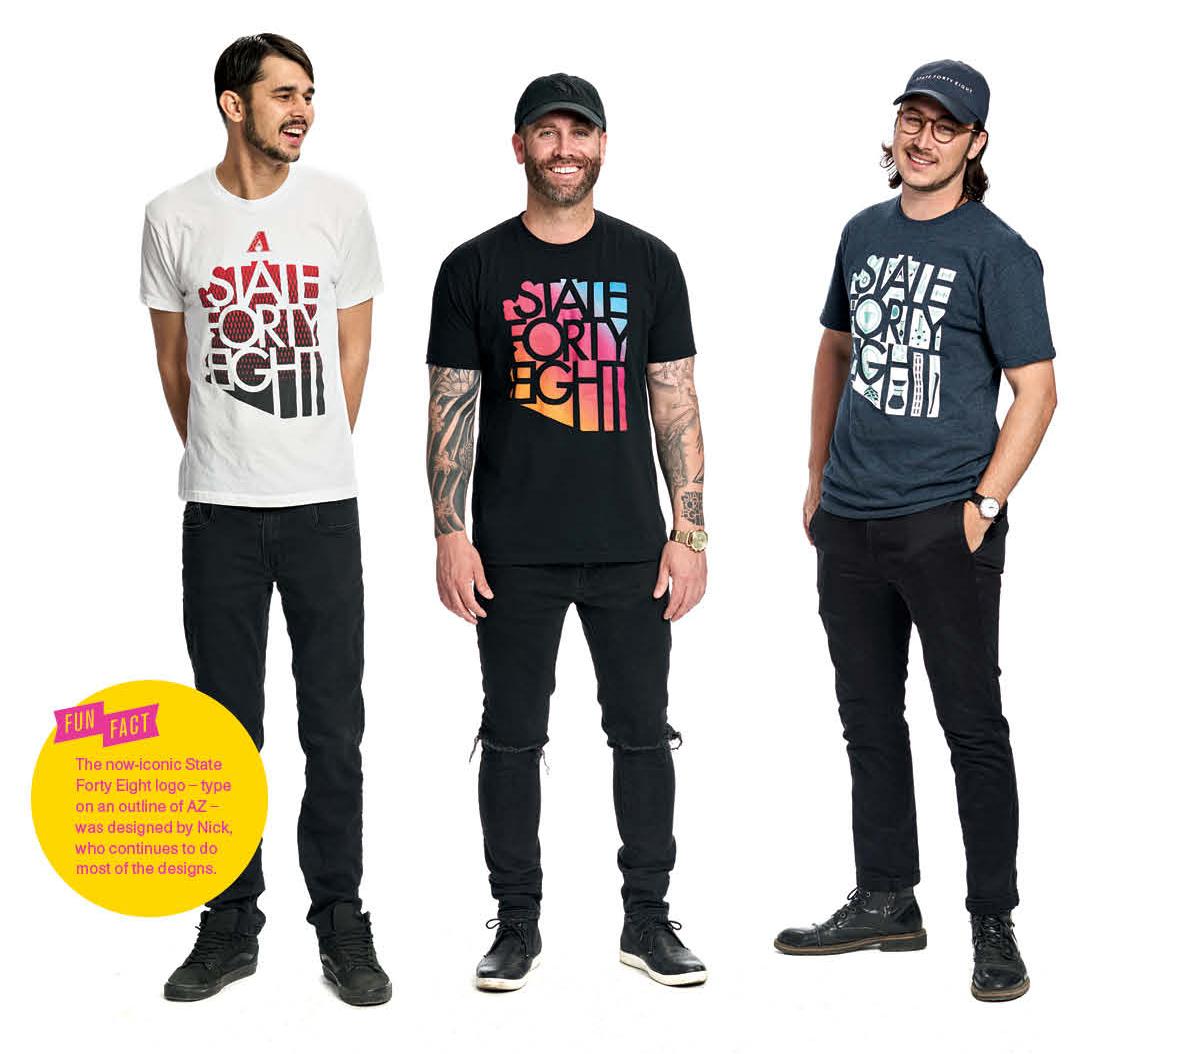 The Fashionistos: Stephen Polando, Mike Spangenberg, Nicholas Polando